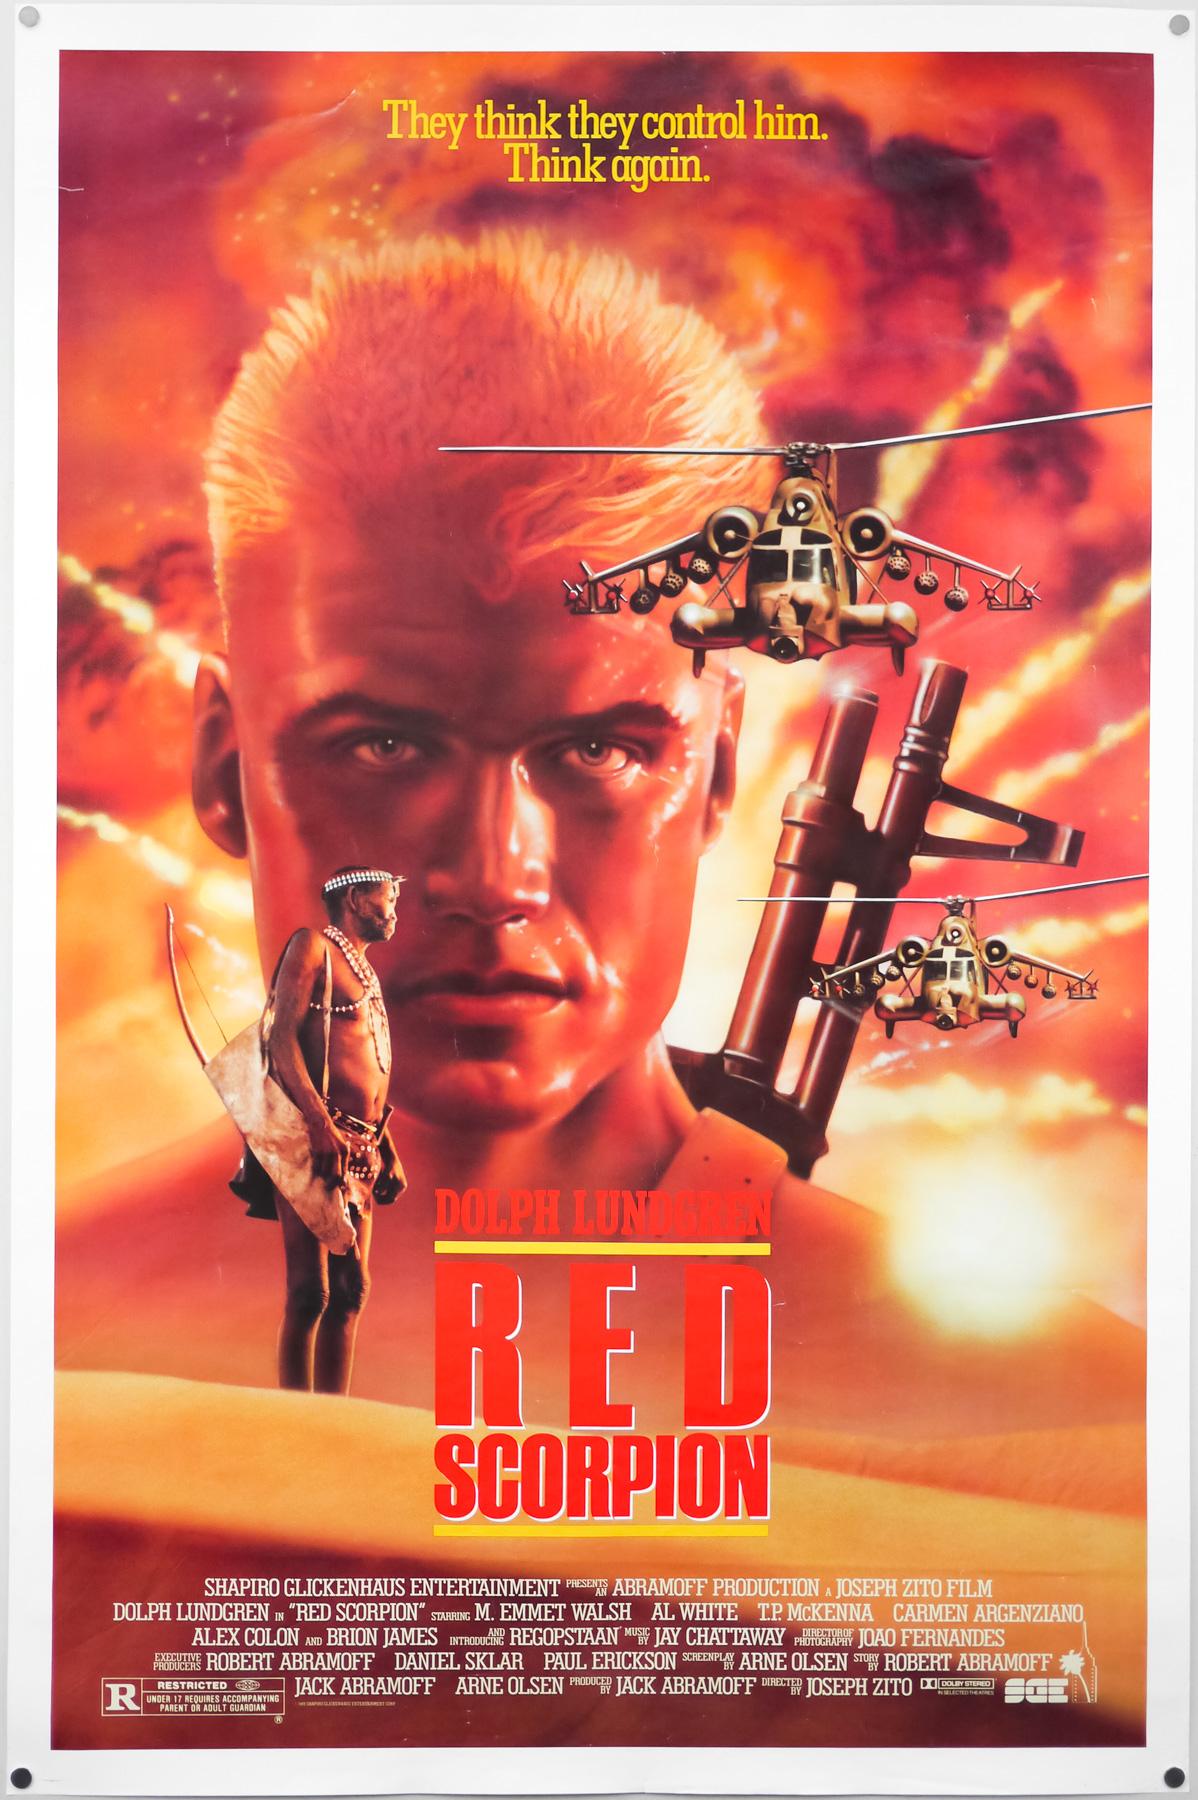 red scorpion-joseph zito-dolph lundgren-m emmet - Comprar